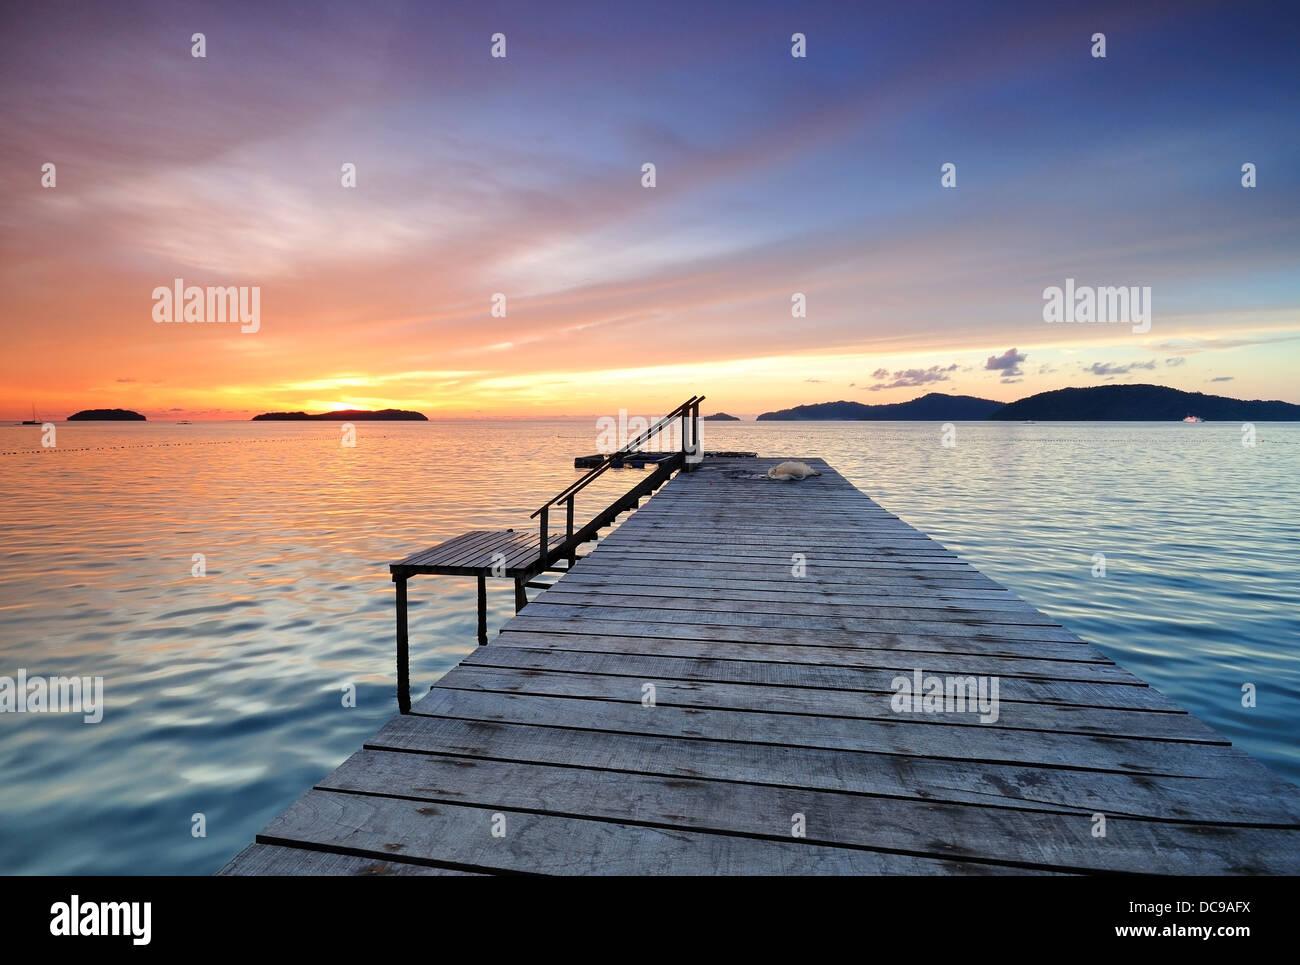 Amazing Sunset with Small Jetty in Kota Kinabalu, Sabah Borneo - Stock Image